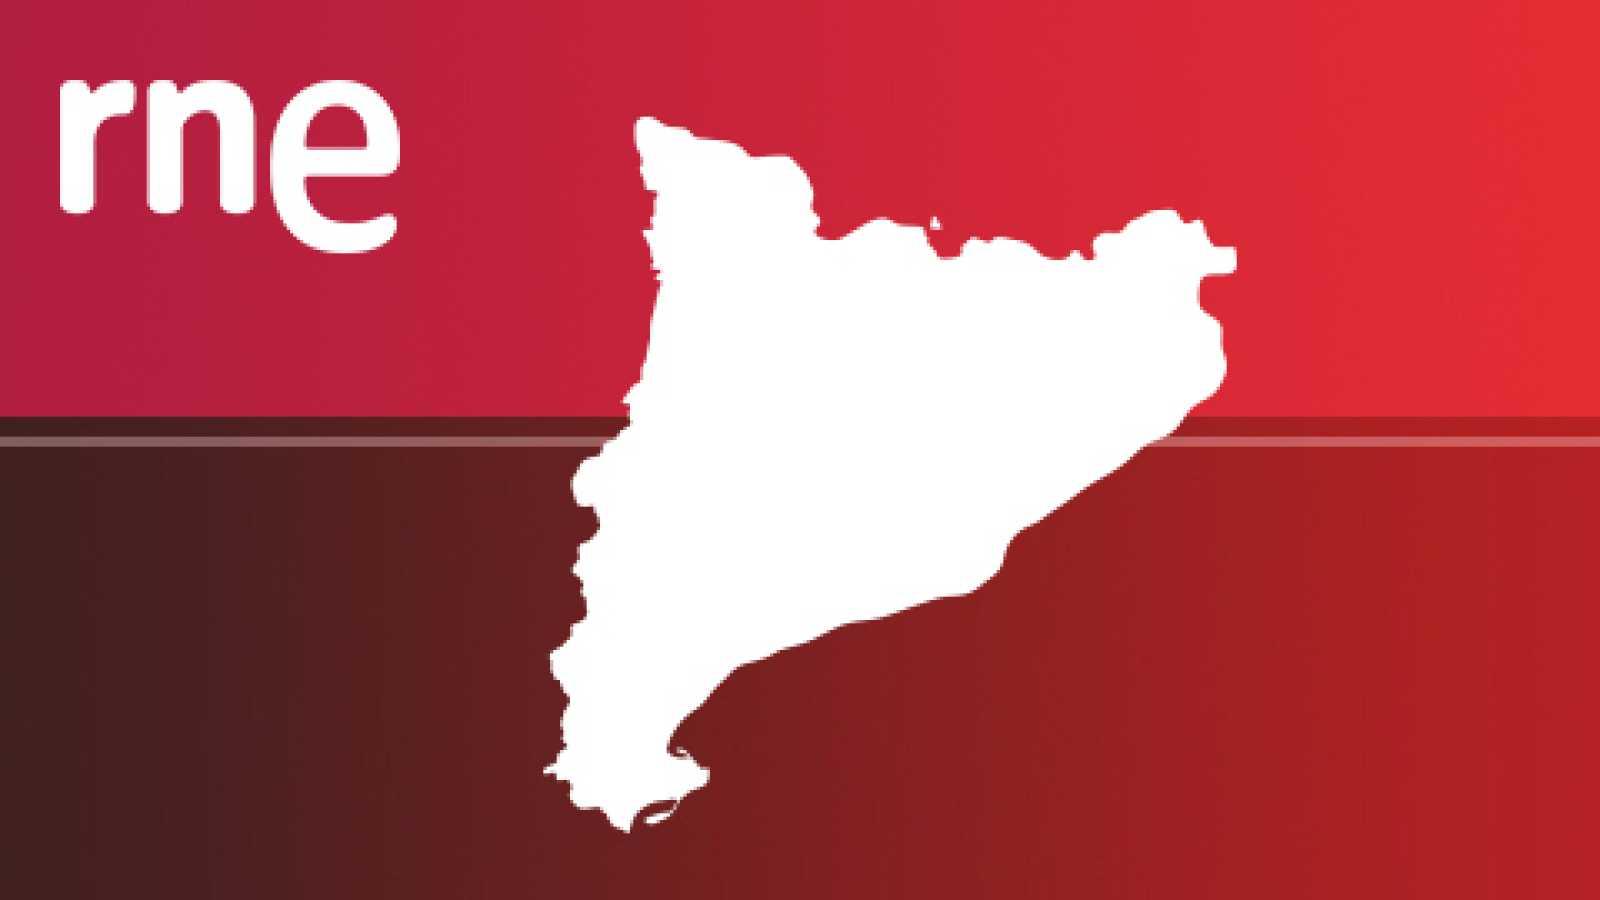 Informatiu Vespre Catalunya - 05/05/21